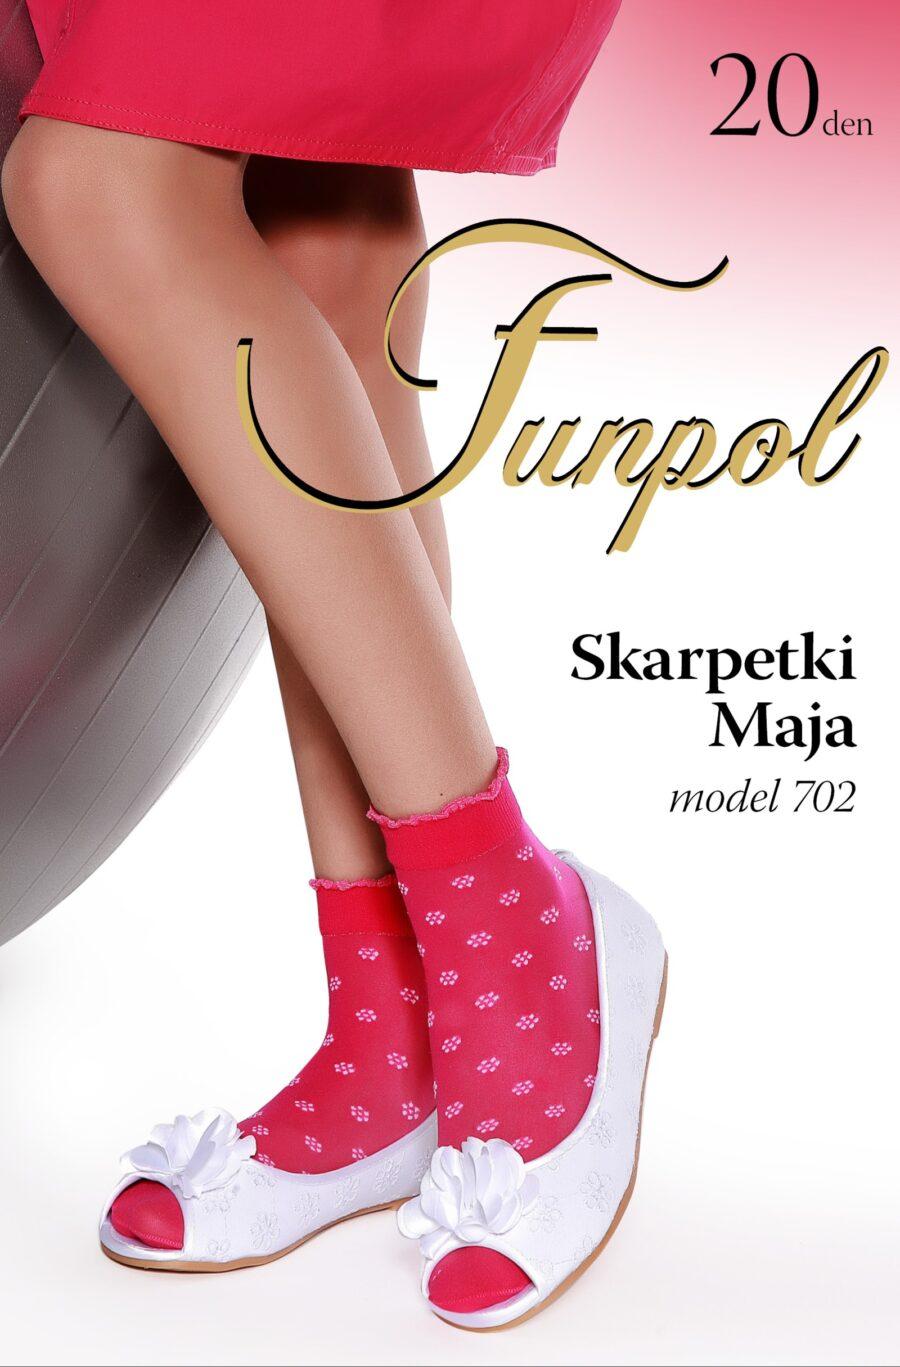 4 pary Skarpetki FUN-POL wzór MAYA 20 DEN